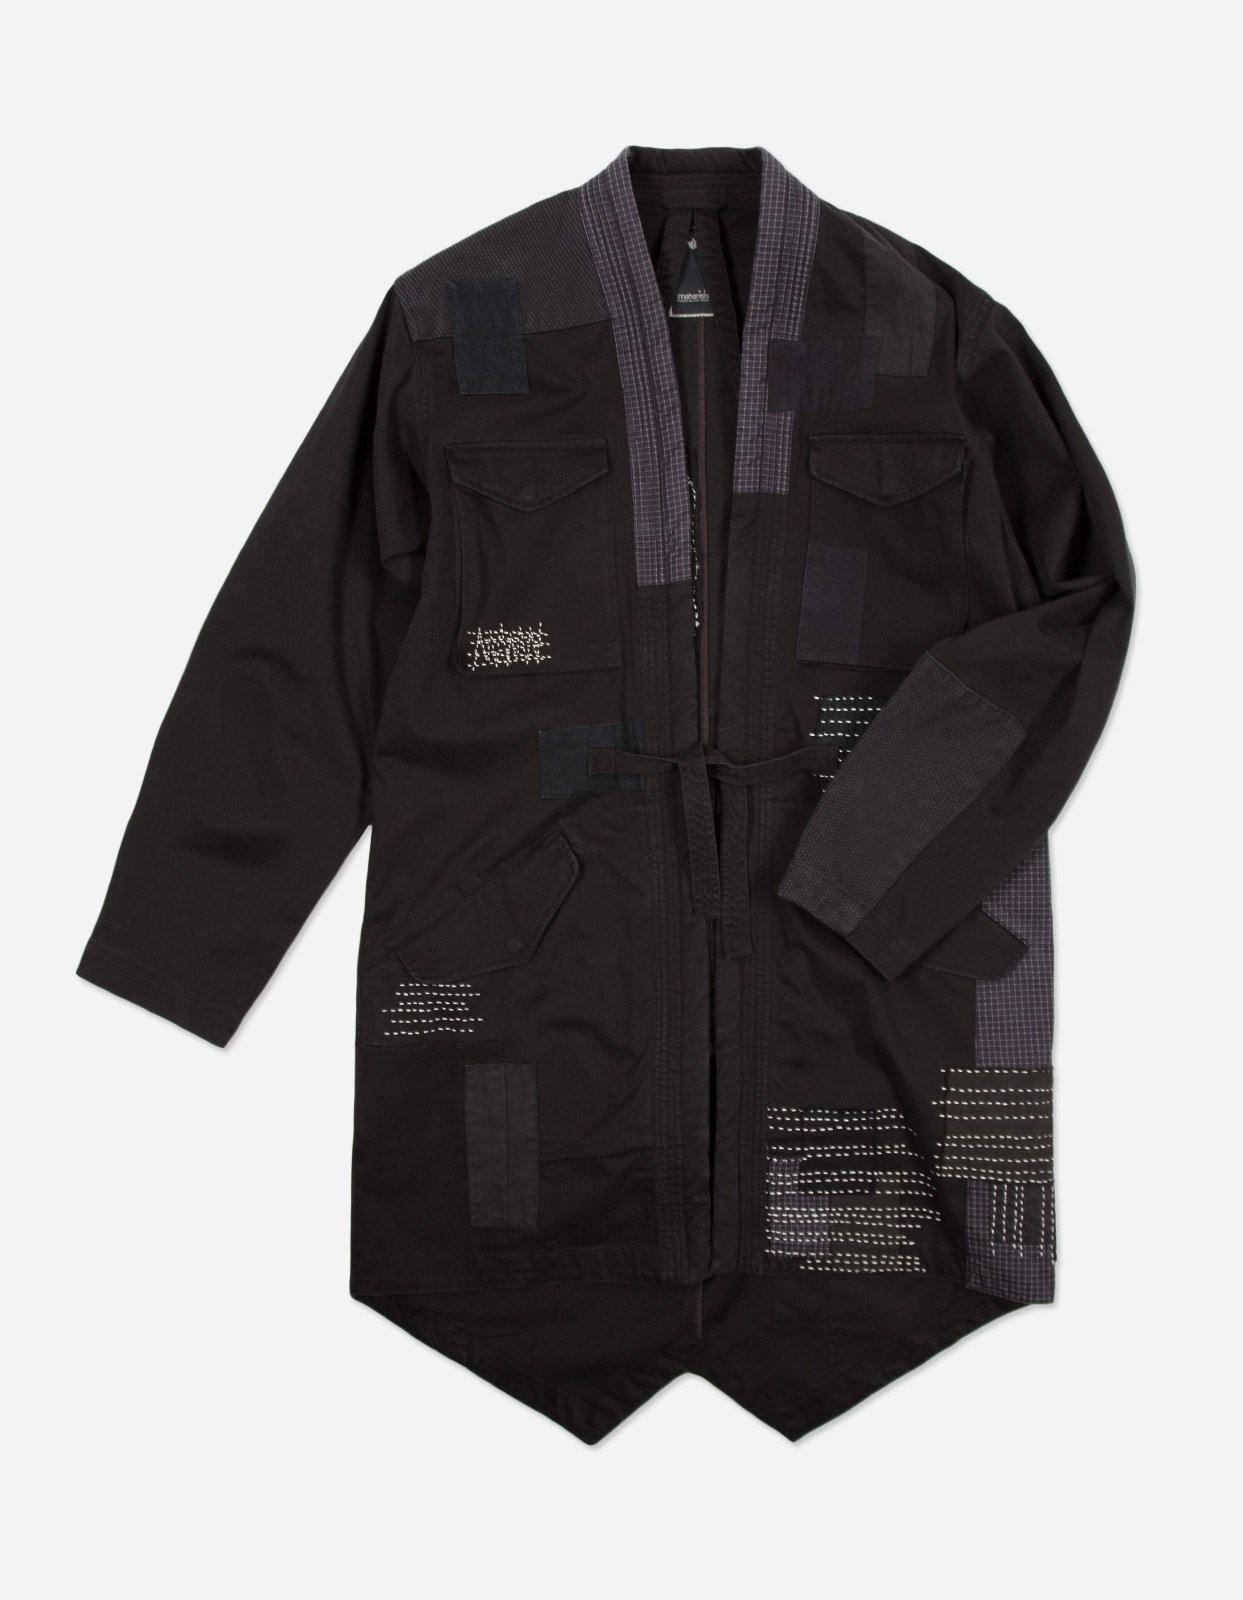 aowampabrus9agnha2jl_maharishi-ss18-6558-boro-ma65-kimono_black_01.jpg?v=1524053257